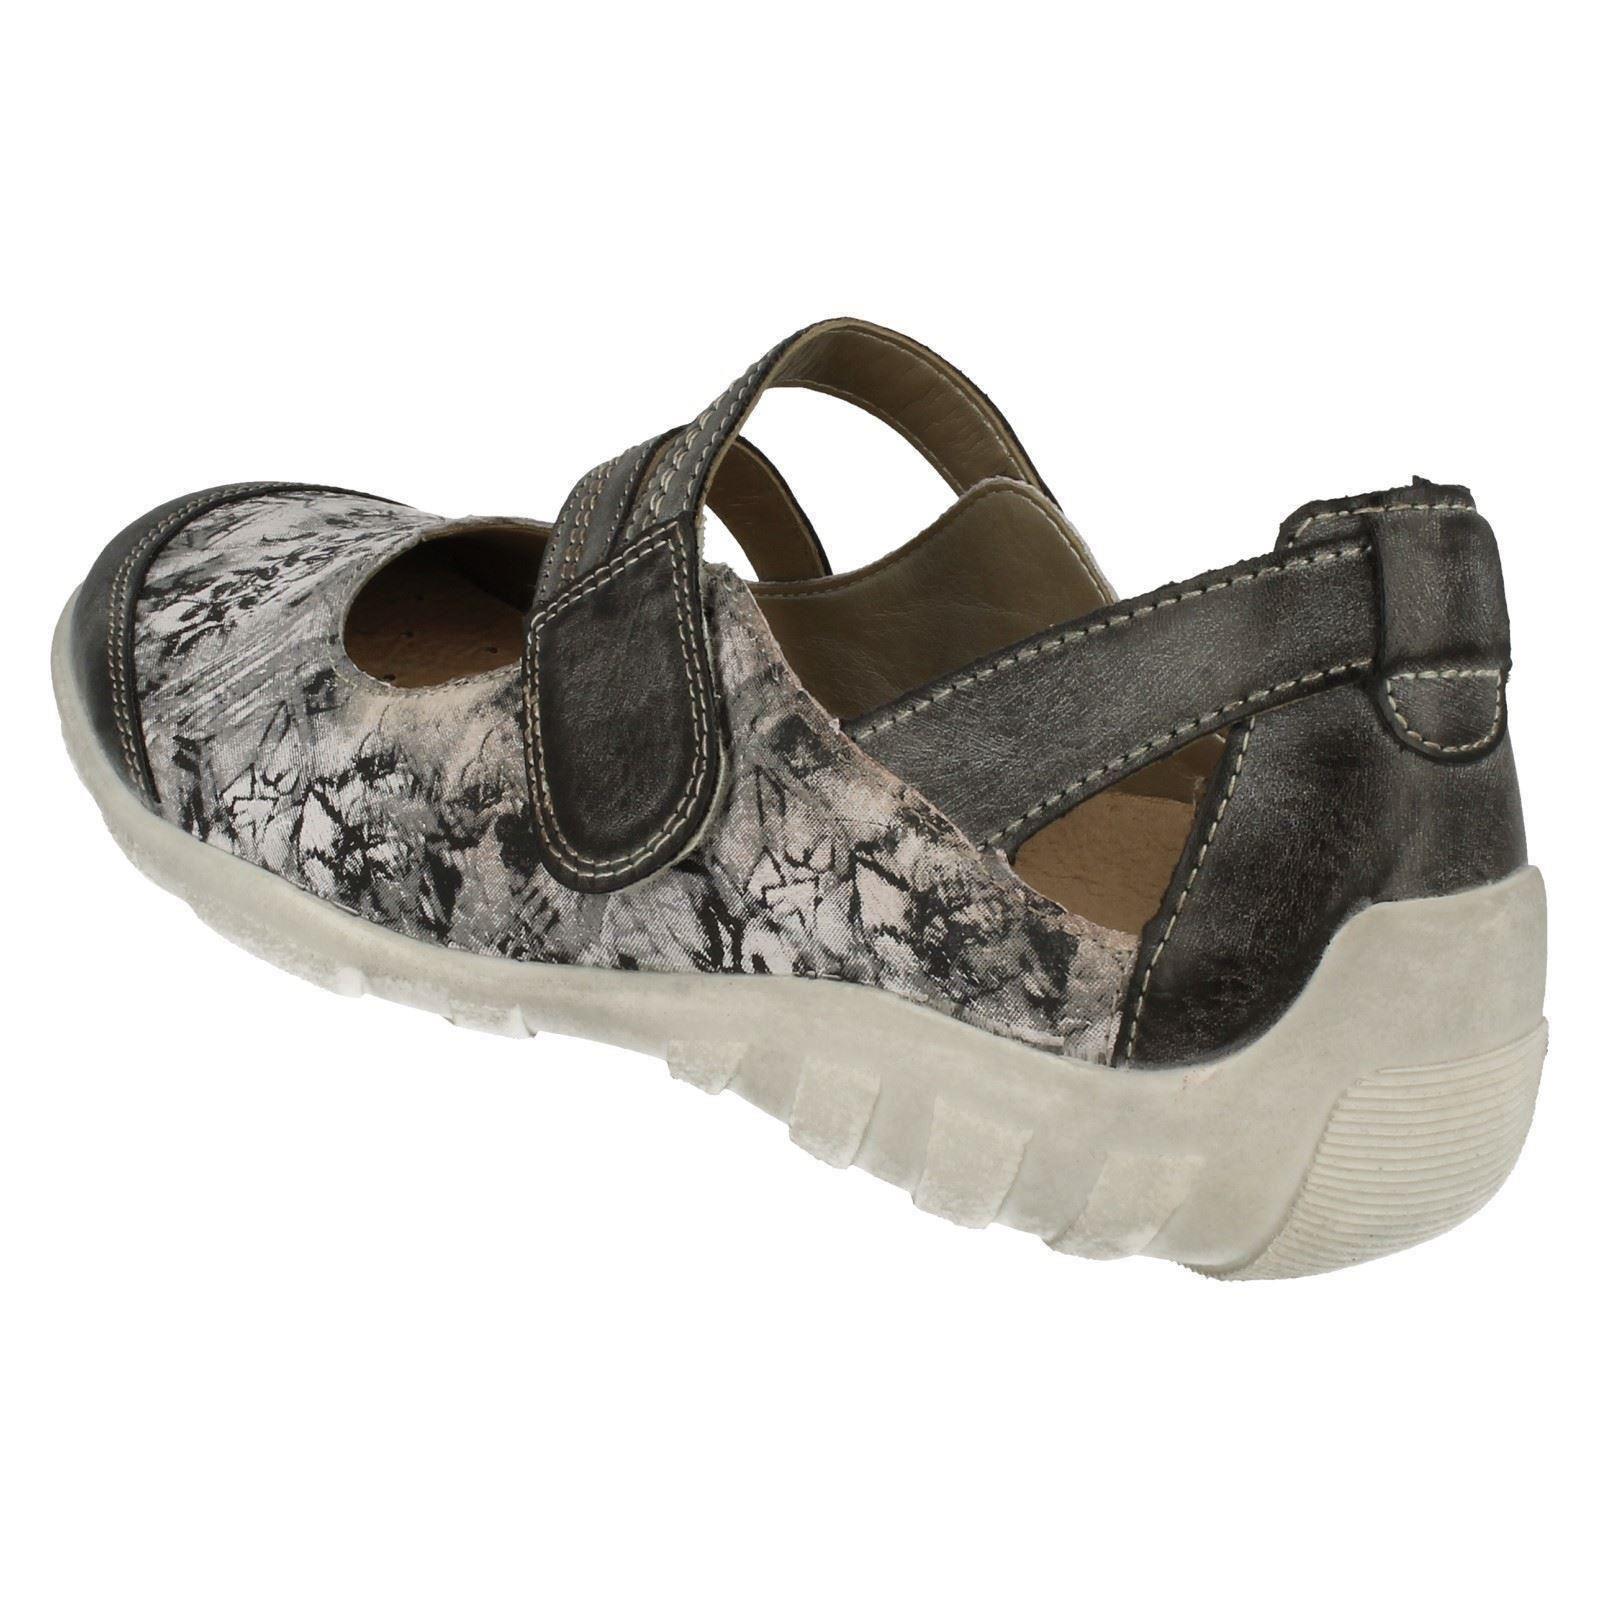 ladies remonte casual shoes 39 r3427 39 ebay. Black Bedroom Furniture Sets. Home Design Ideas